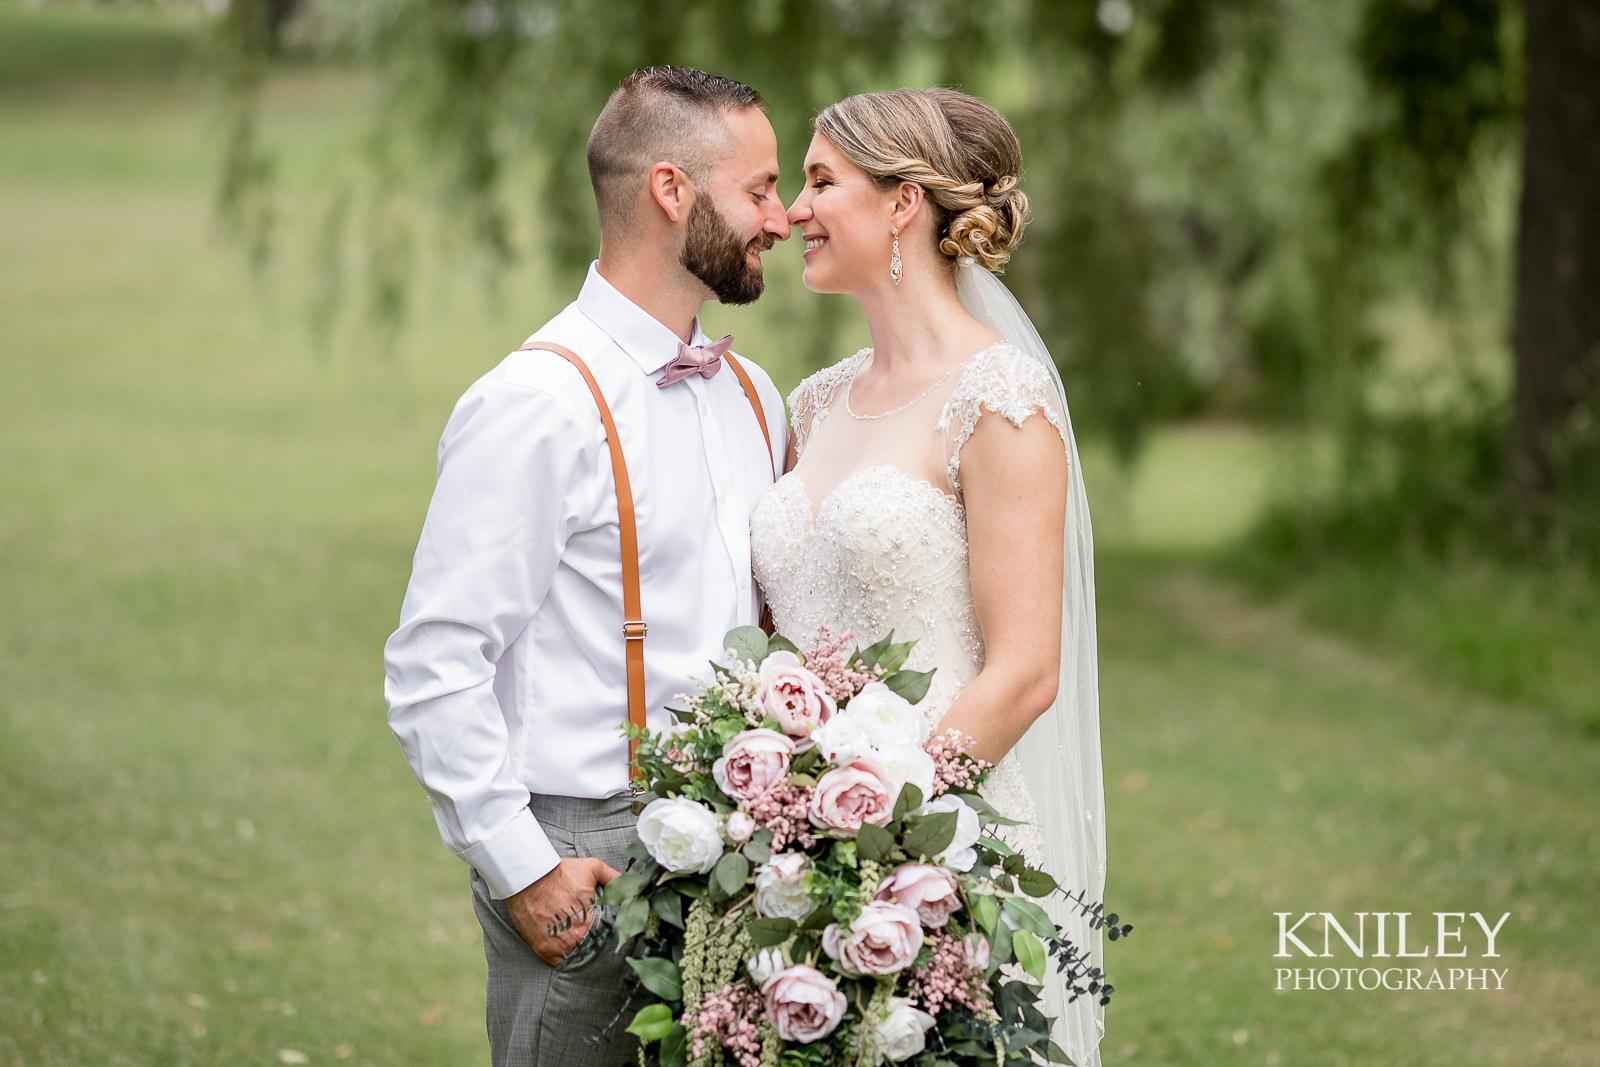 063 - Ontario Golf Club Wedding Pictures - XT2B8625.jpg